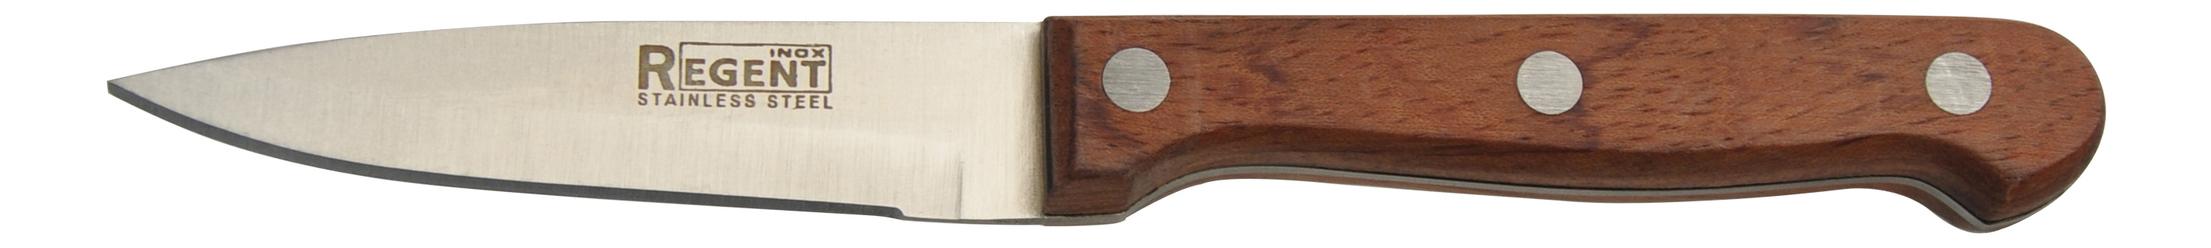 Нож кухонный REGENT inox 93 WH3